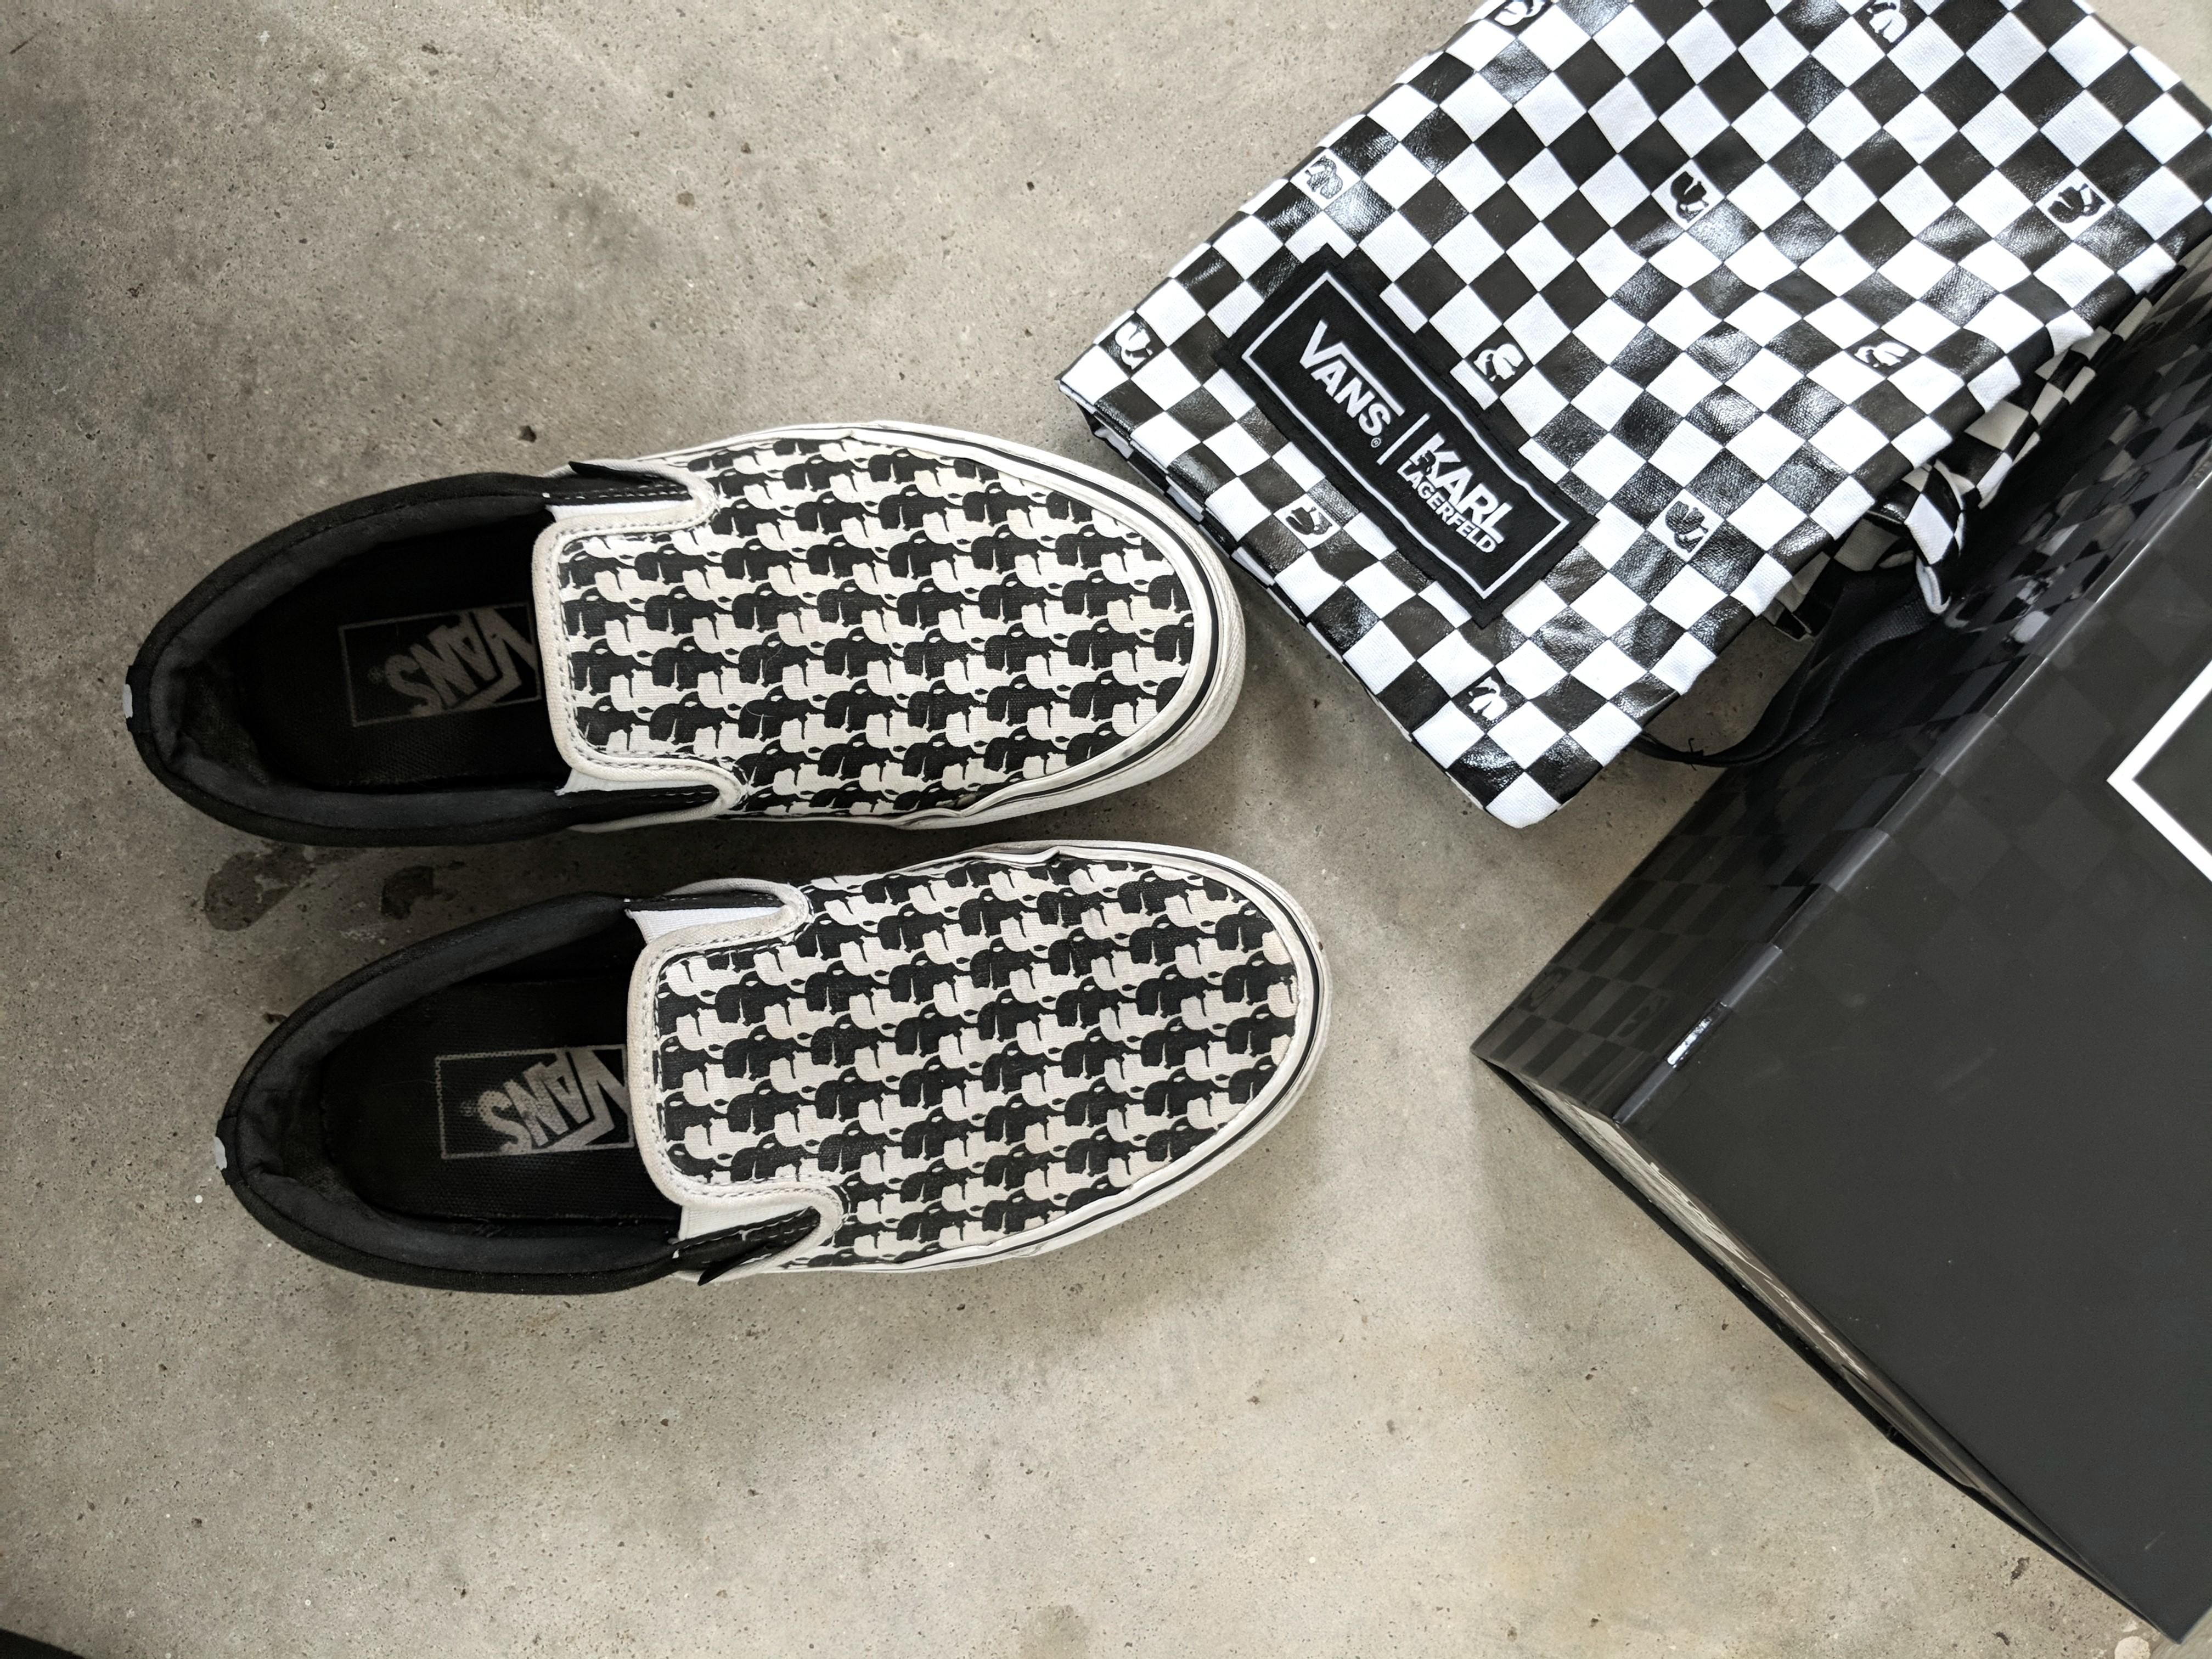 bad19e7a00 Home · Women s Fashion · Shoes · Sneakers. photo photo ...